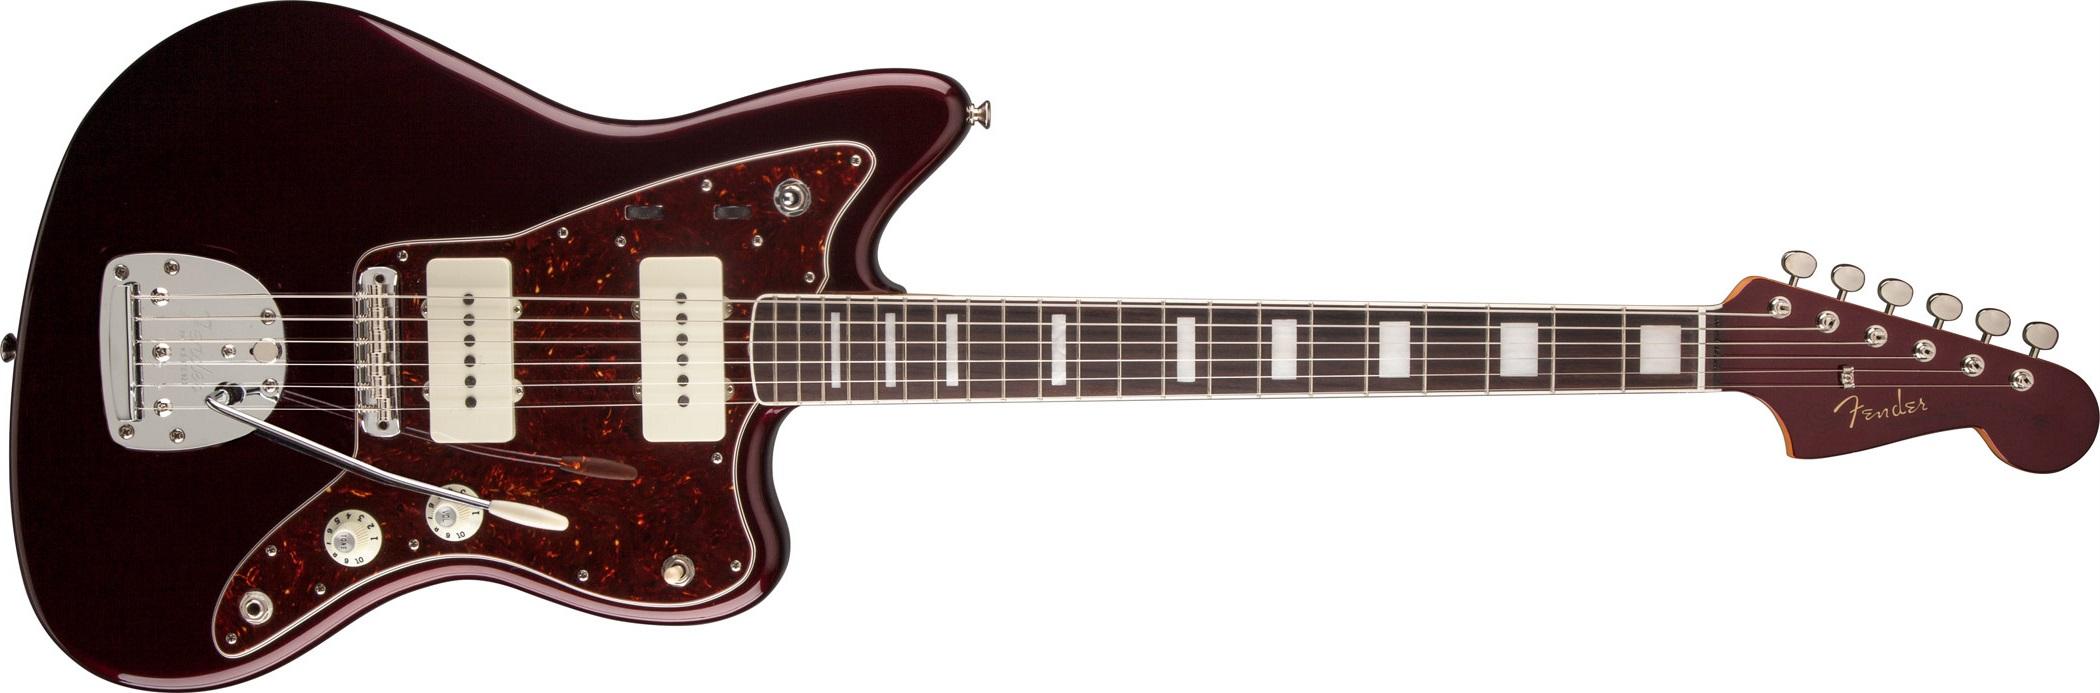 Fender Troy Van Leeuwen Jazzmaster RW OX